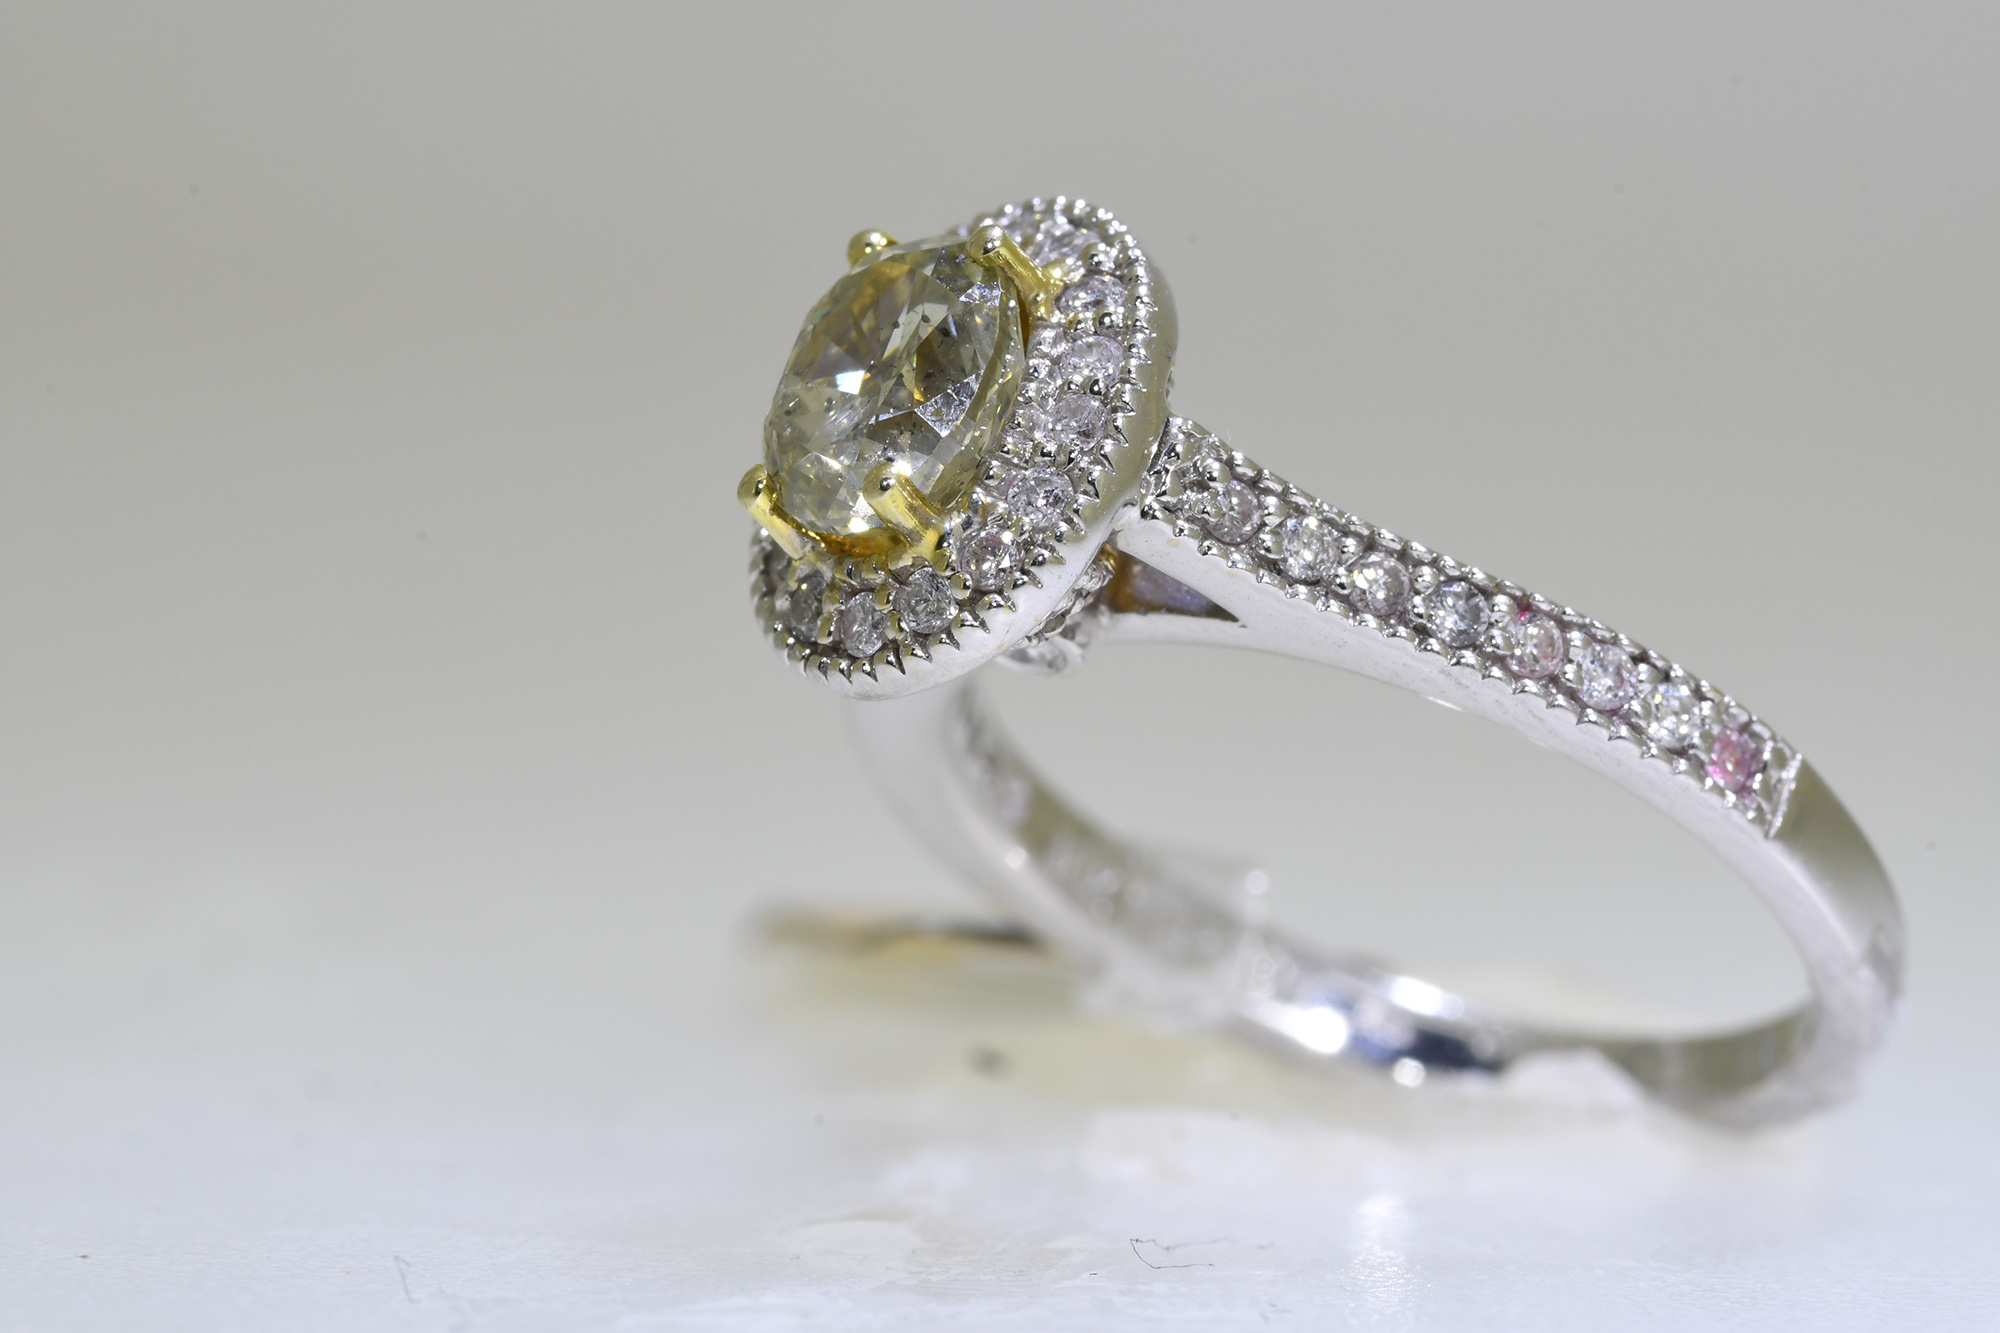 Yellow Diamond Ring - Image 3 of 3